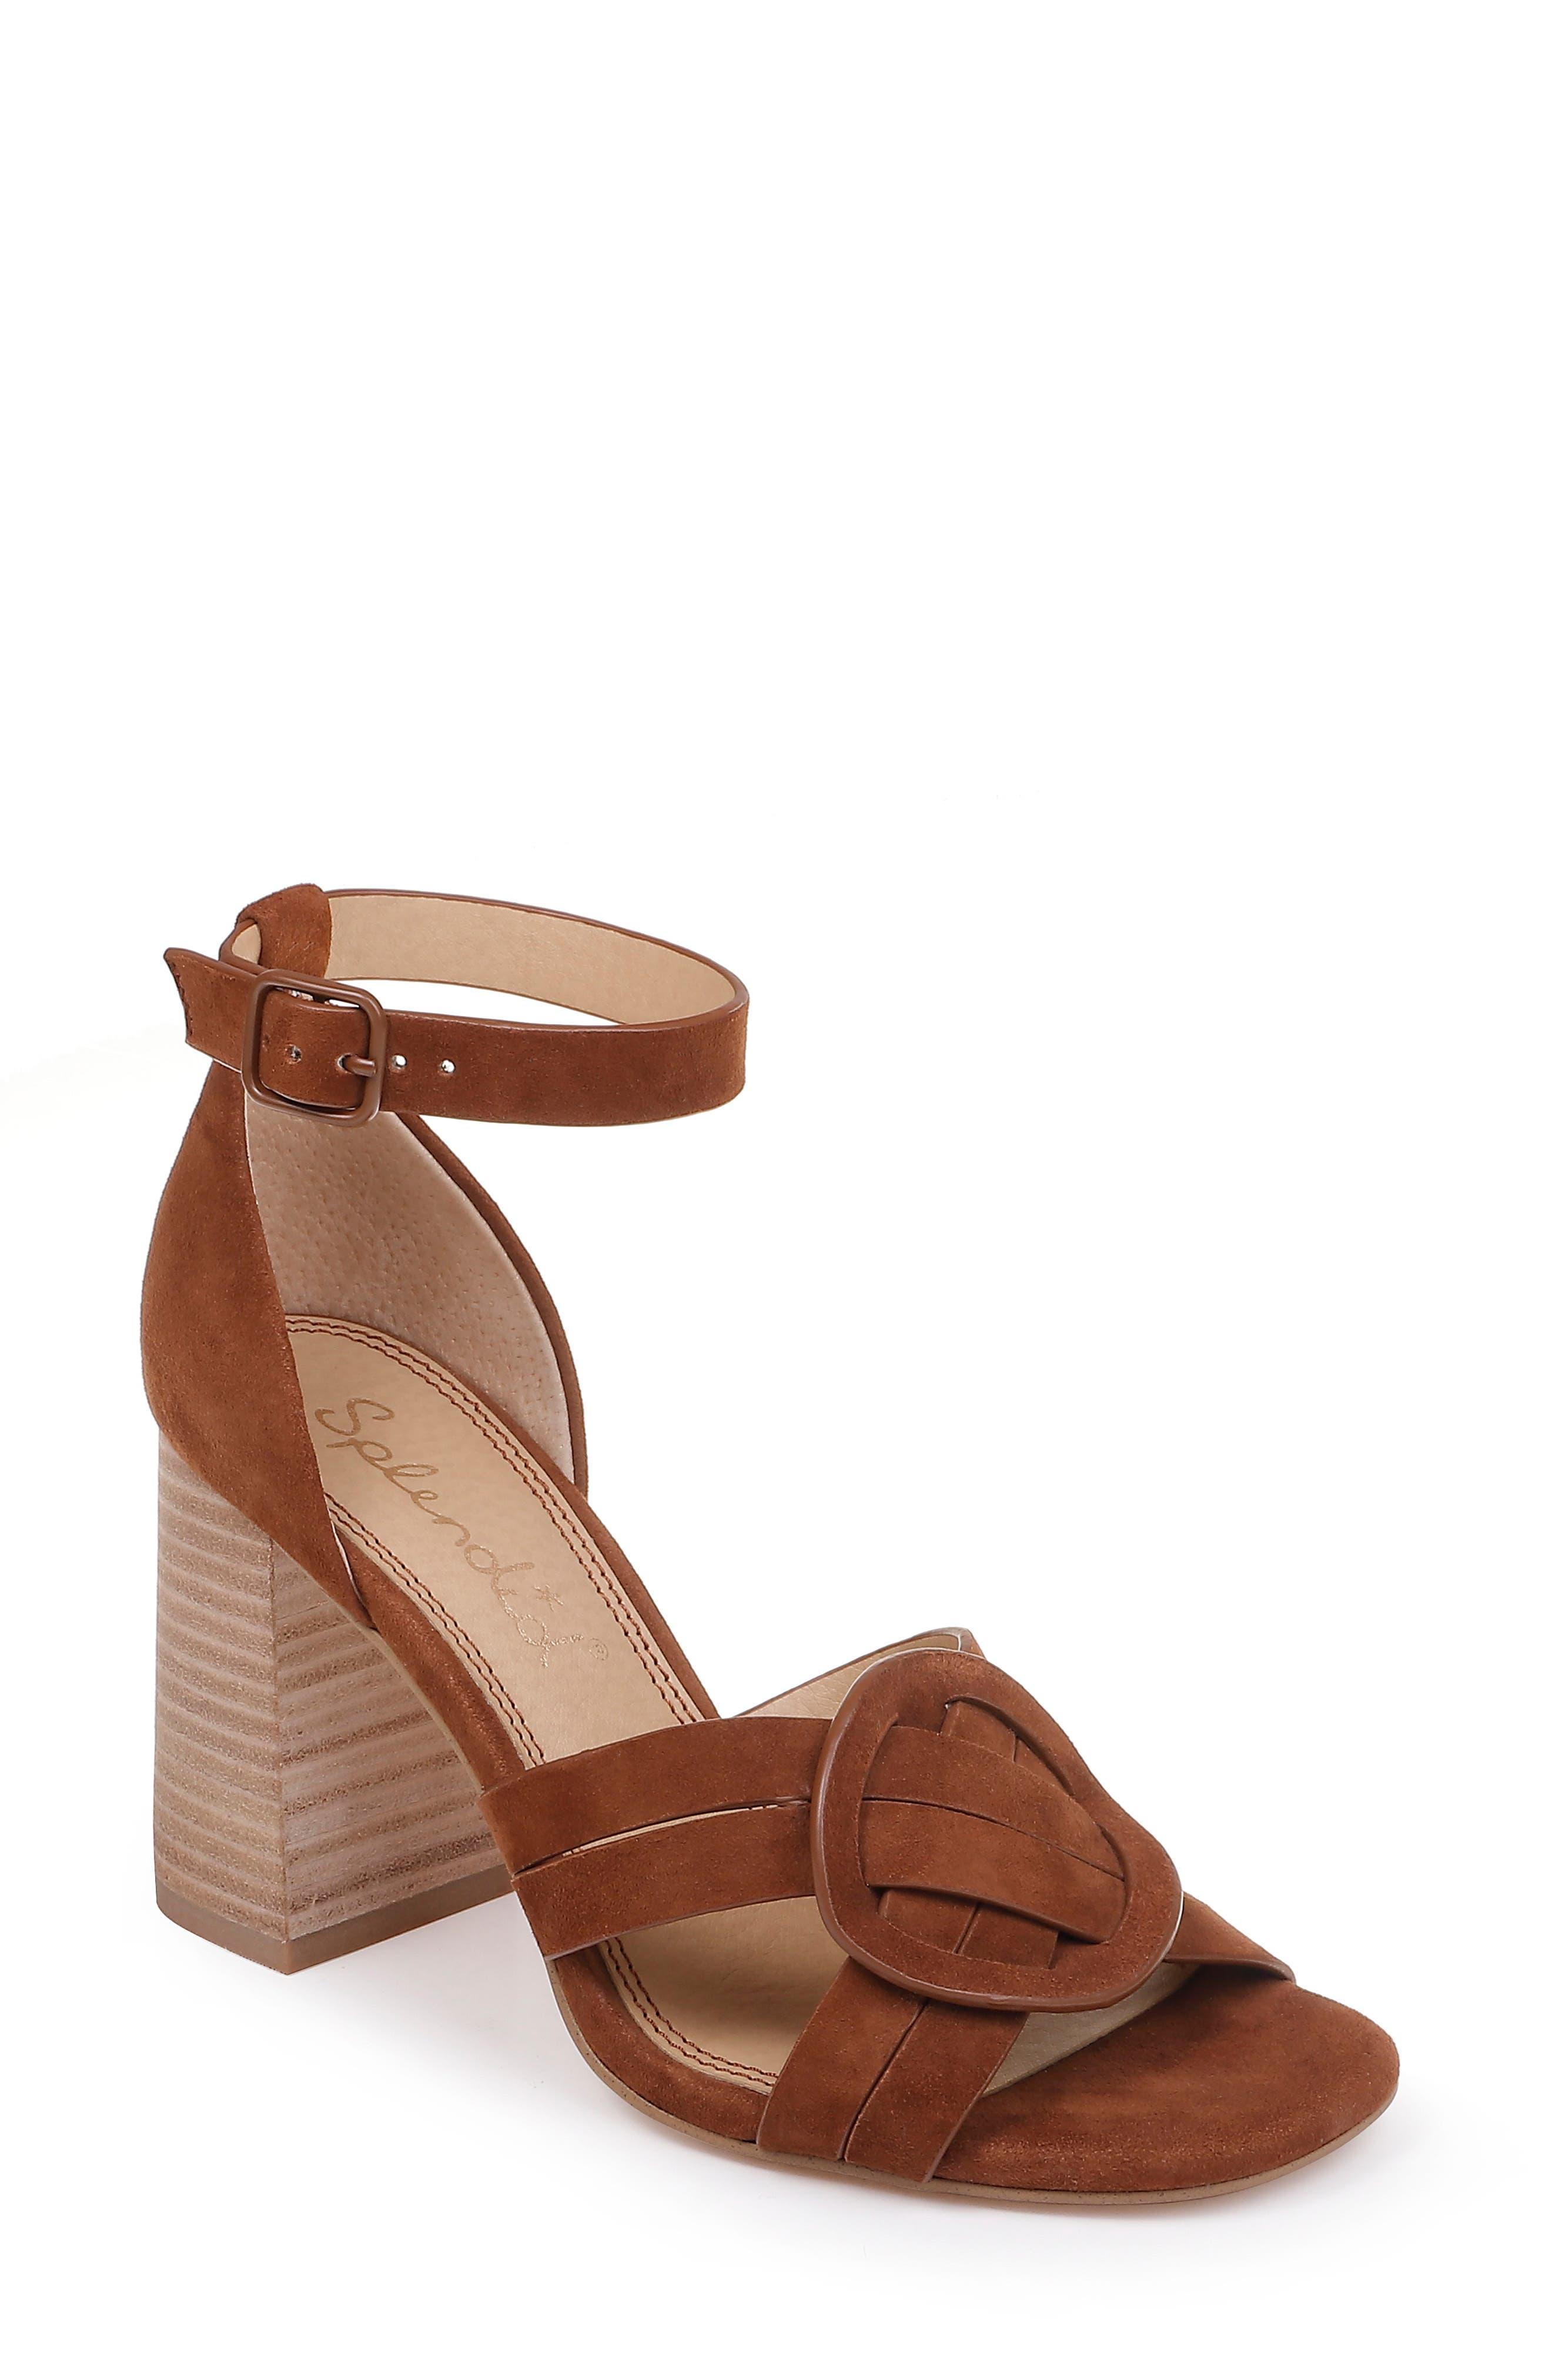 SPLENDID, Tallie Ankle Strap Sandal, Main thumbnail 1, color, CHESTNUT SUEDE